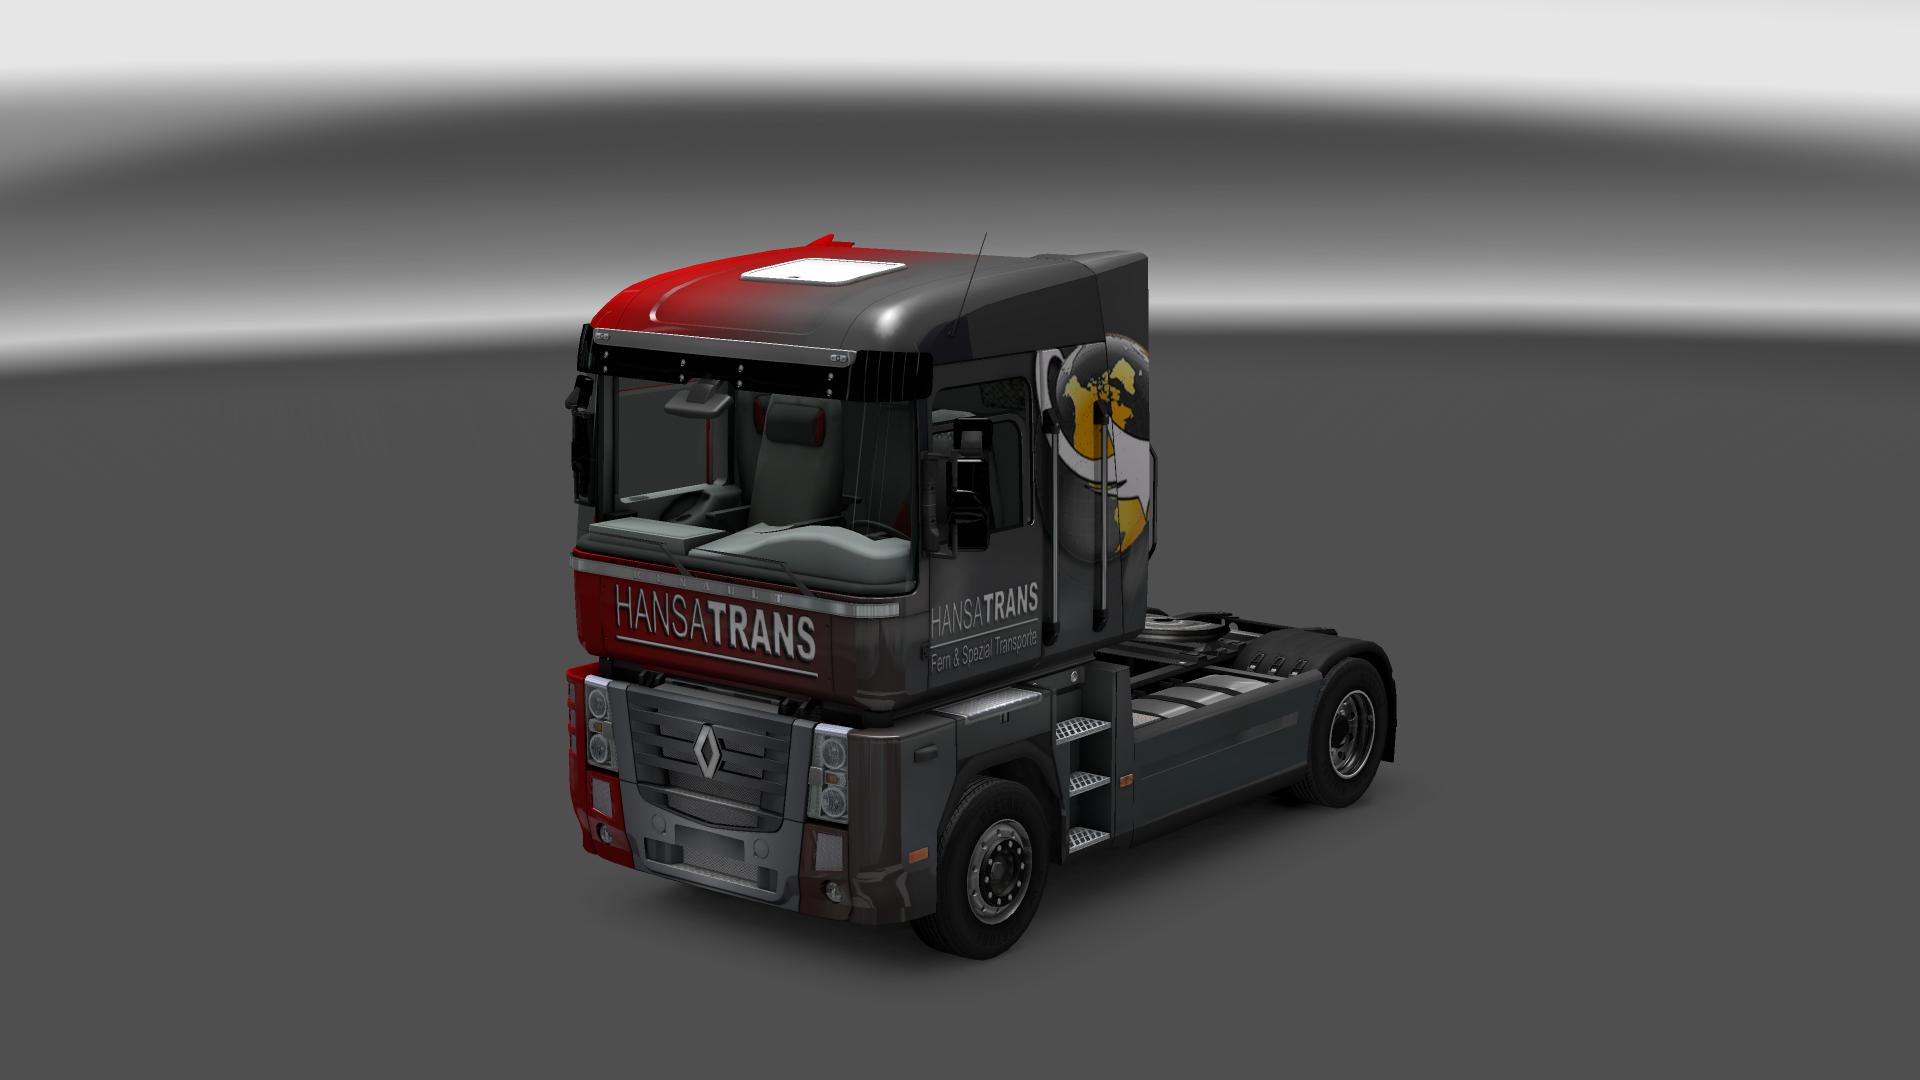 Hansa-Trans  Fern & Spezialtransporte Ets2_00024pikv6